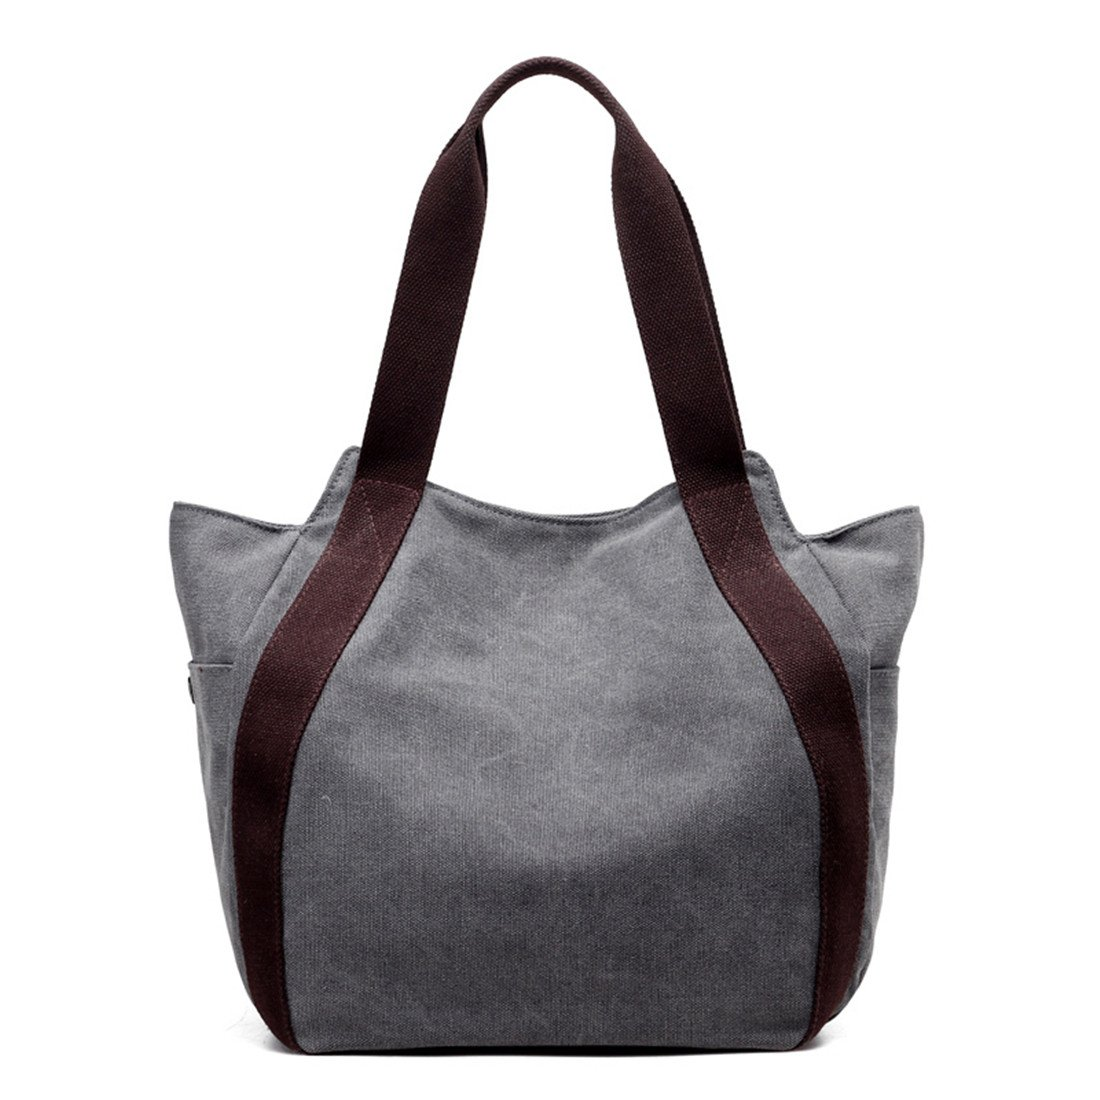 Genbagbar Tote Bag Canvas Top Handle Bags Casual Travel Shoulder Handbag for Women (Grey)